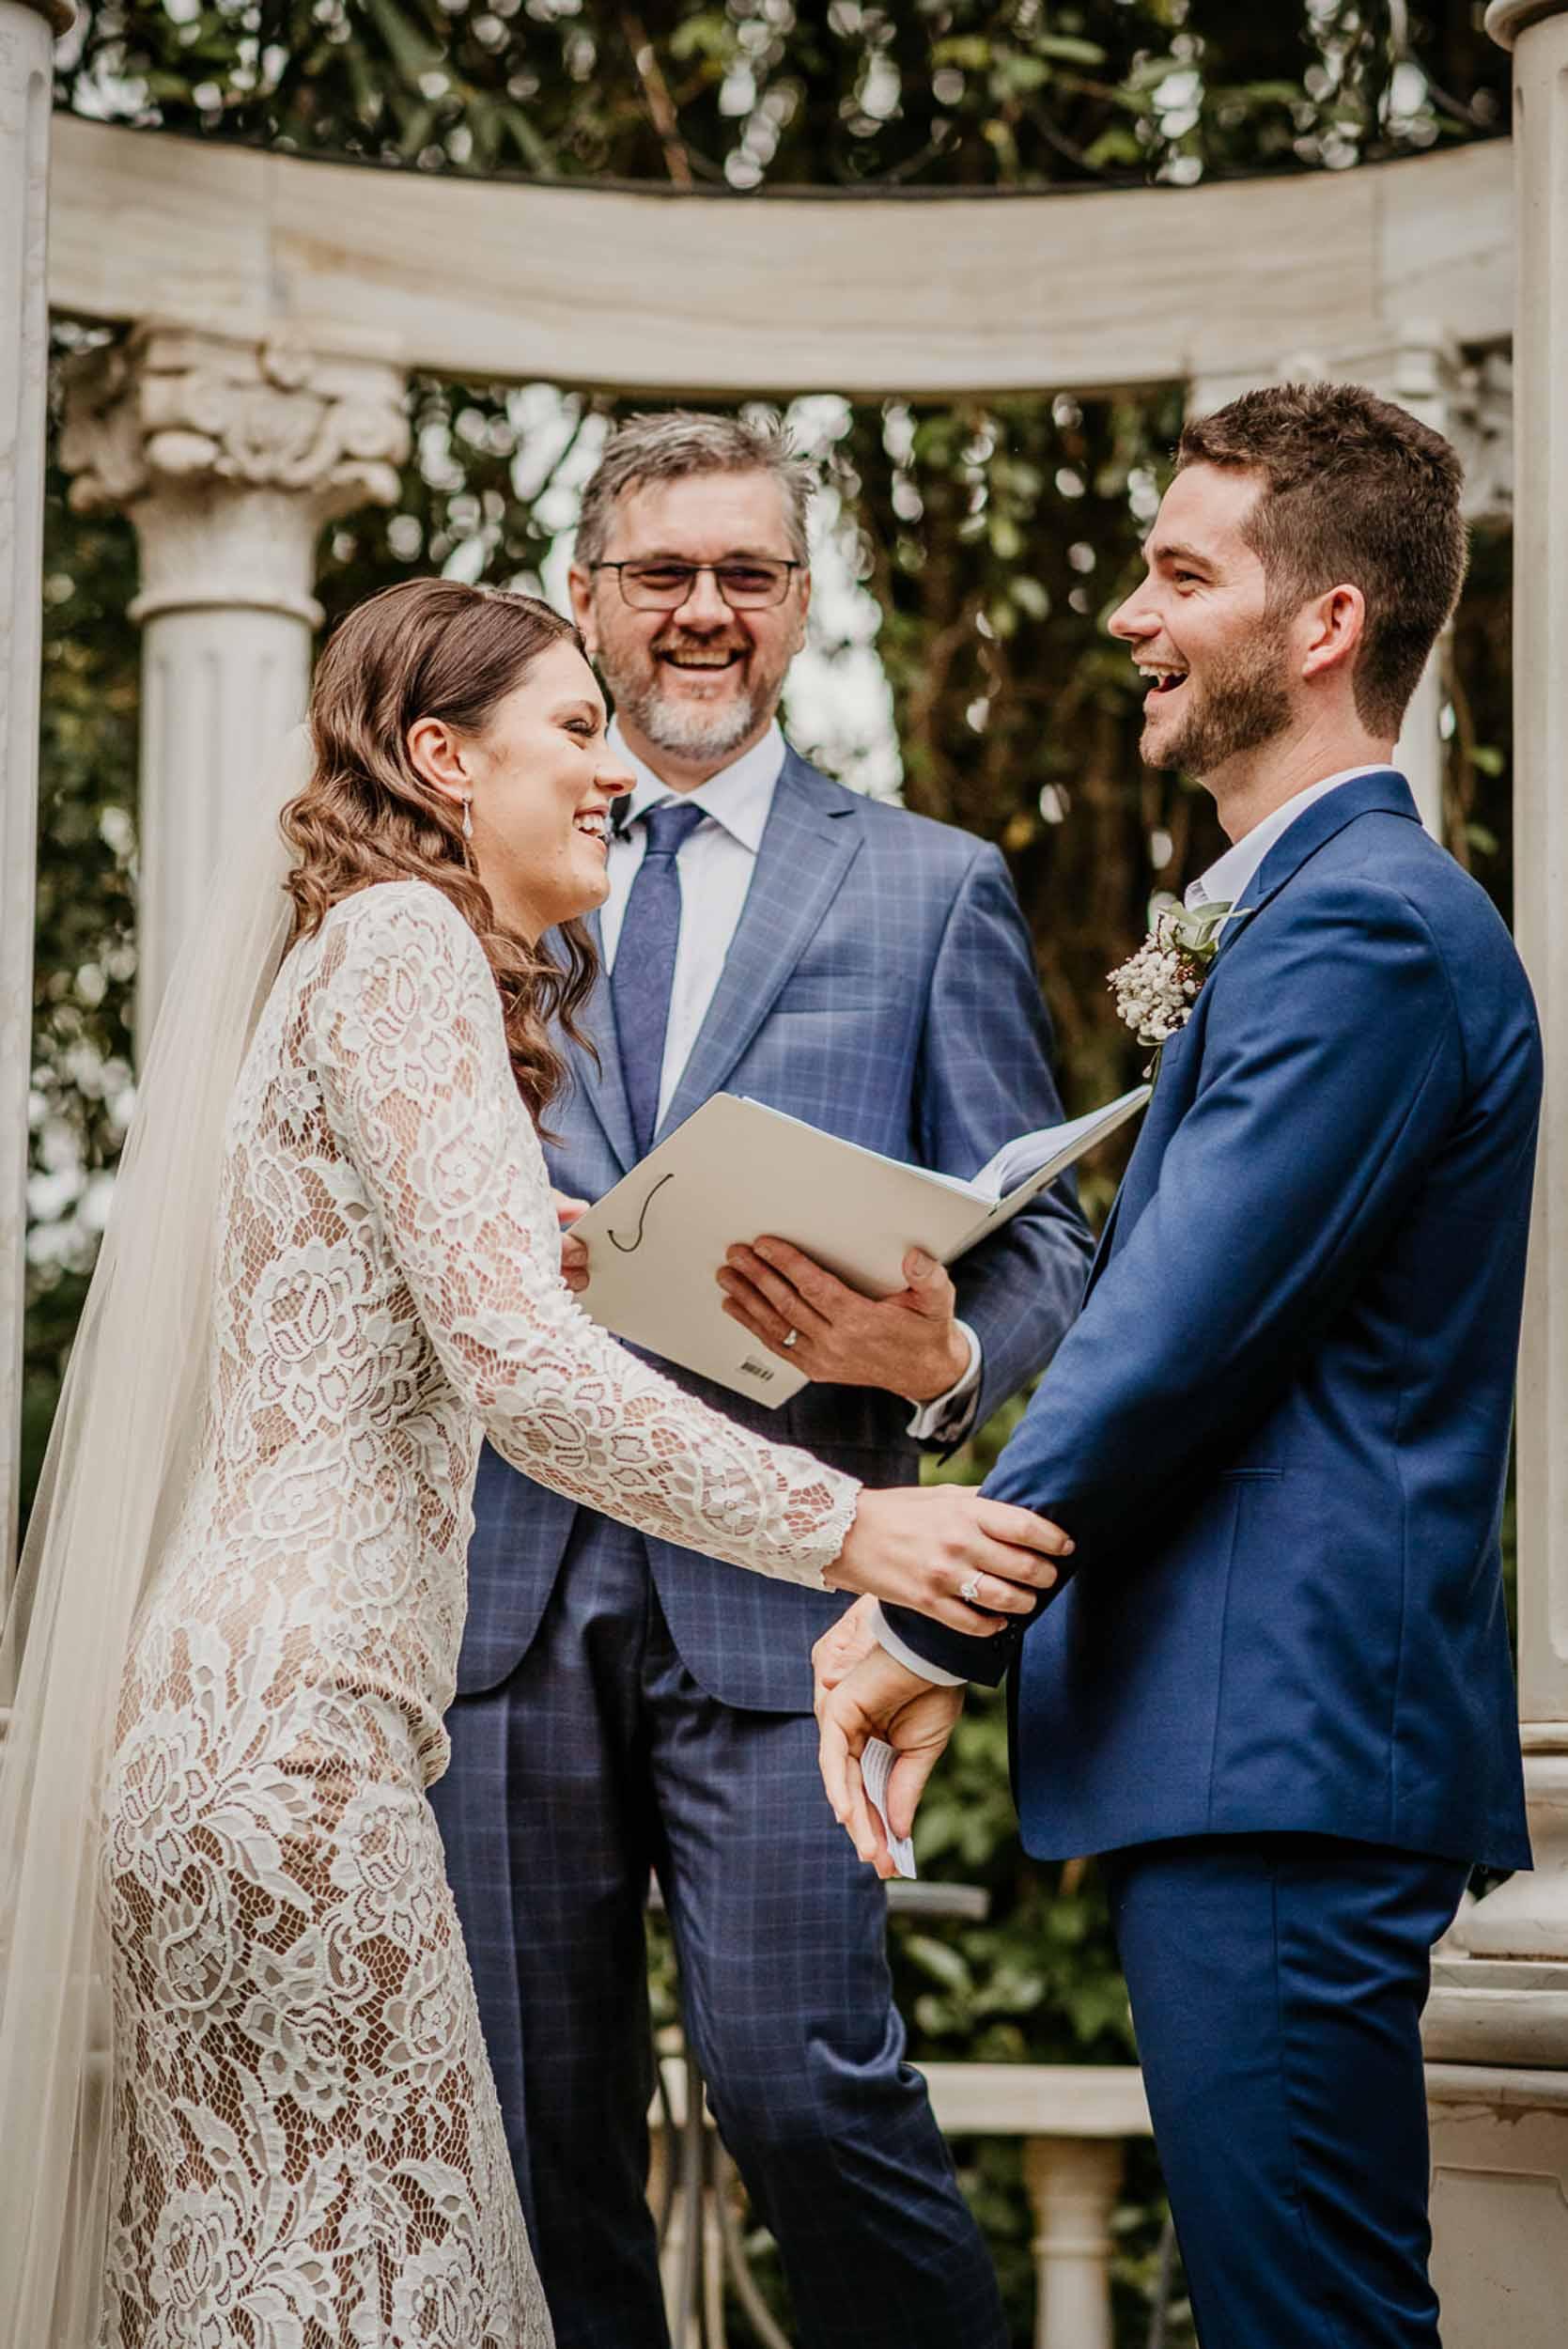 The Raw Photographer - Cairns Wedding Photographer - Laloli - Cairns Garden Wedding - Irene Costa's Devine Bridal-20.jpg